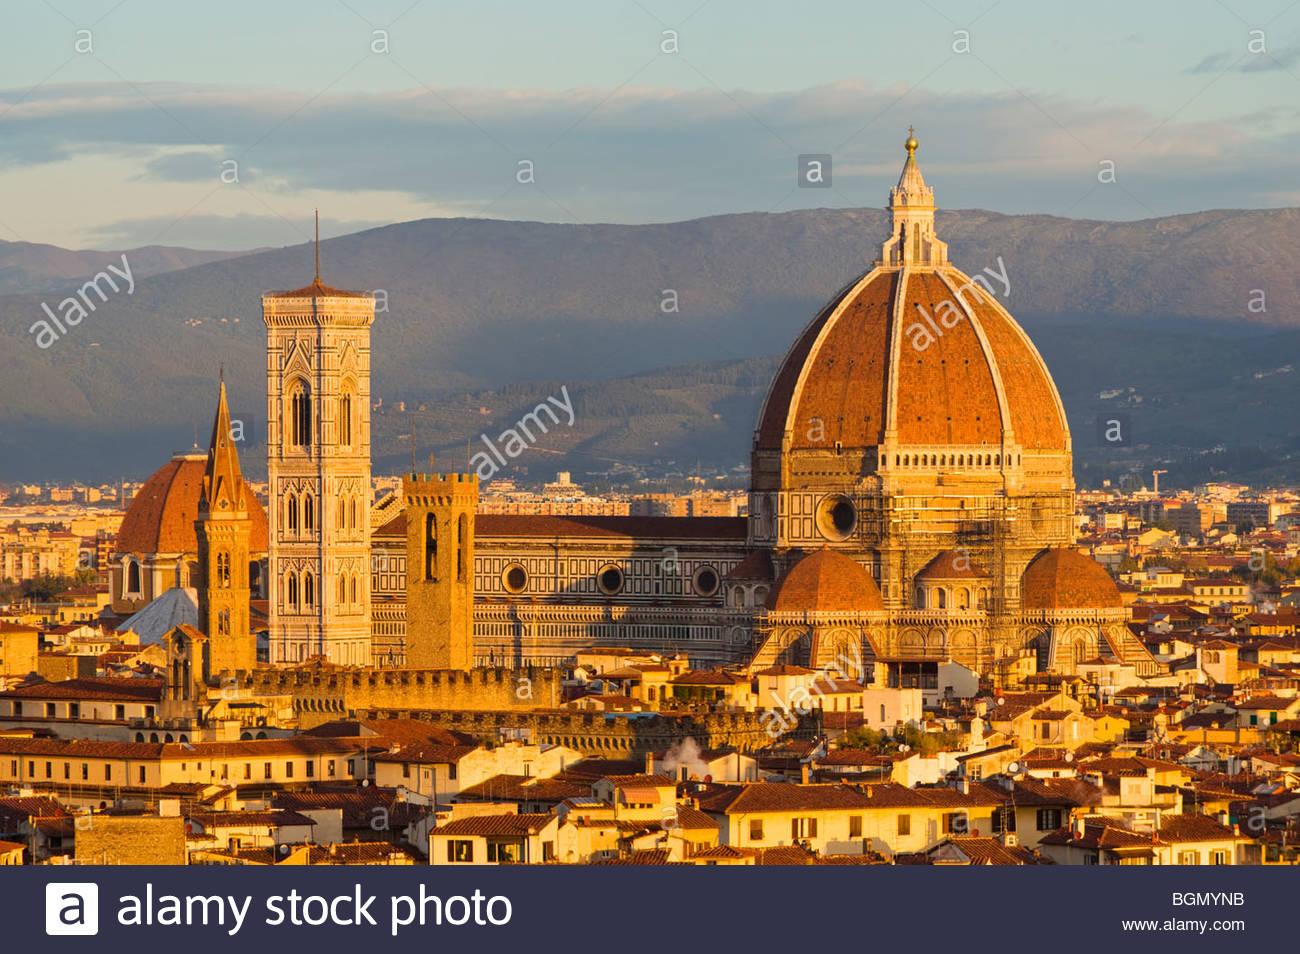 Der Dom (Basilica di Santa Maria del Fiore), Florenz, Toskana, Italien. Stockbild